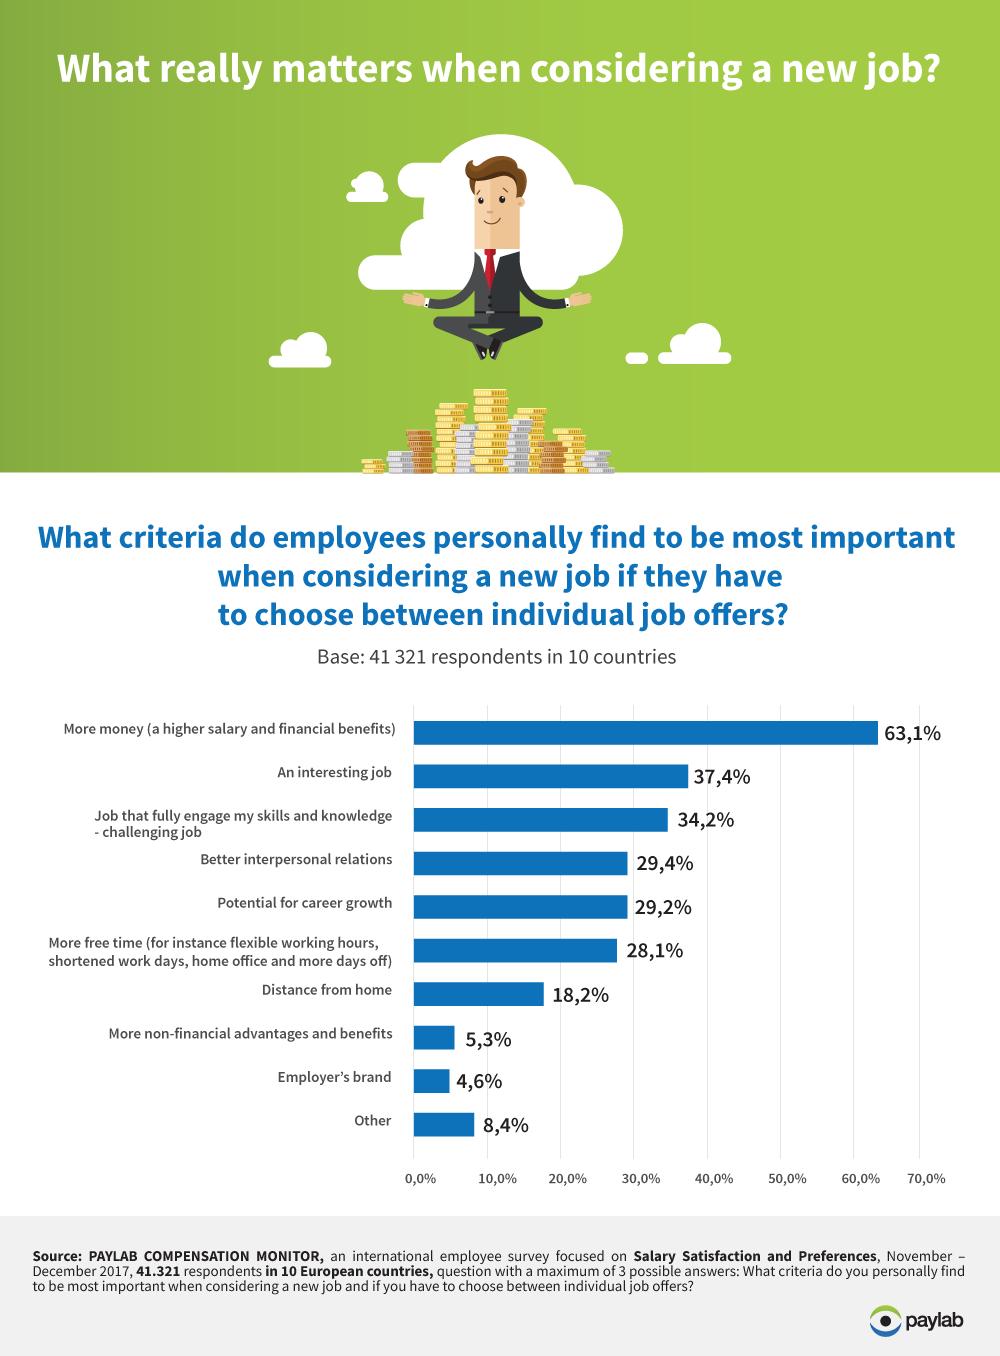 Job criteria preferences with new job